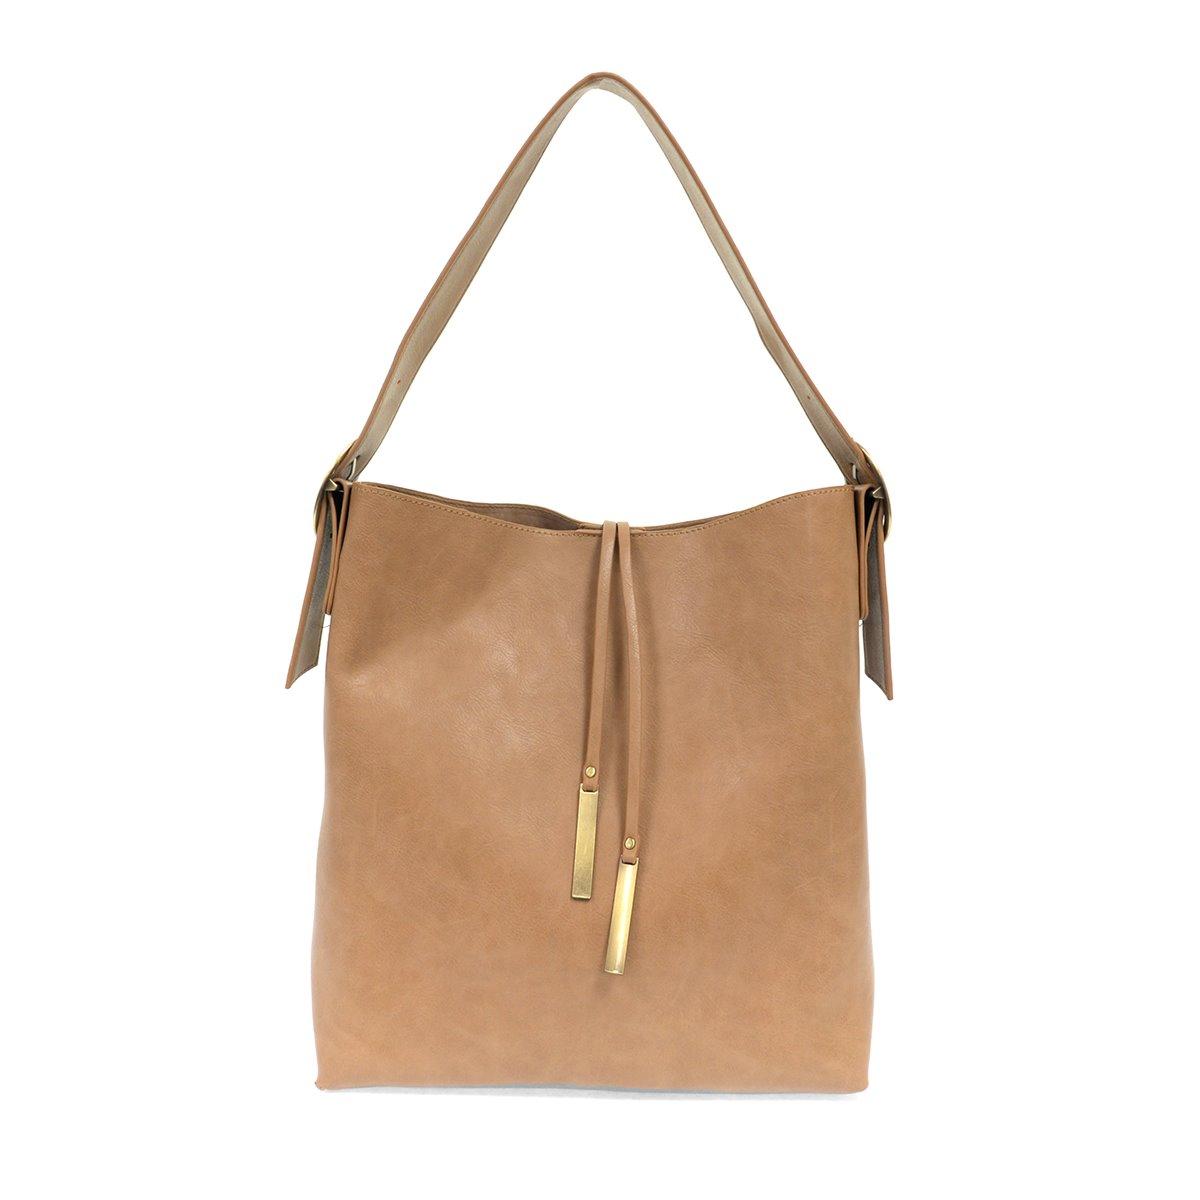 Khaki Jillian Hobo Handbag with Tassel